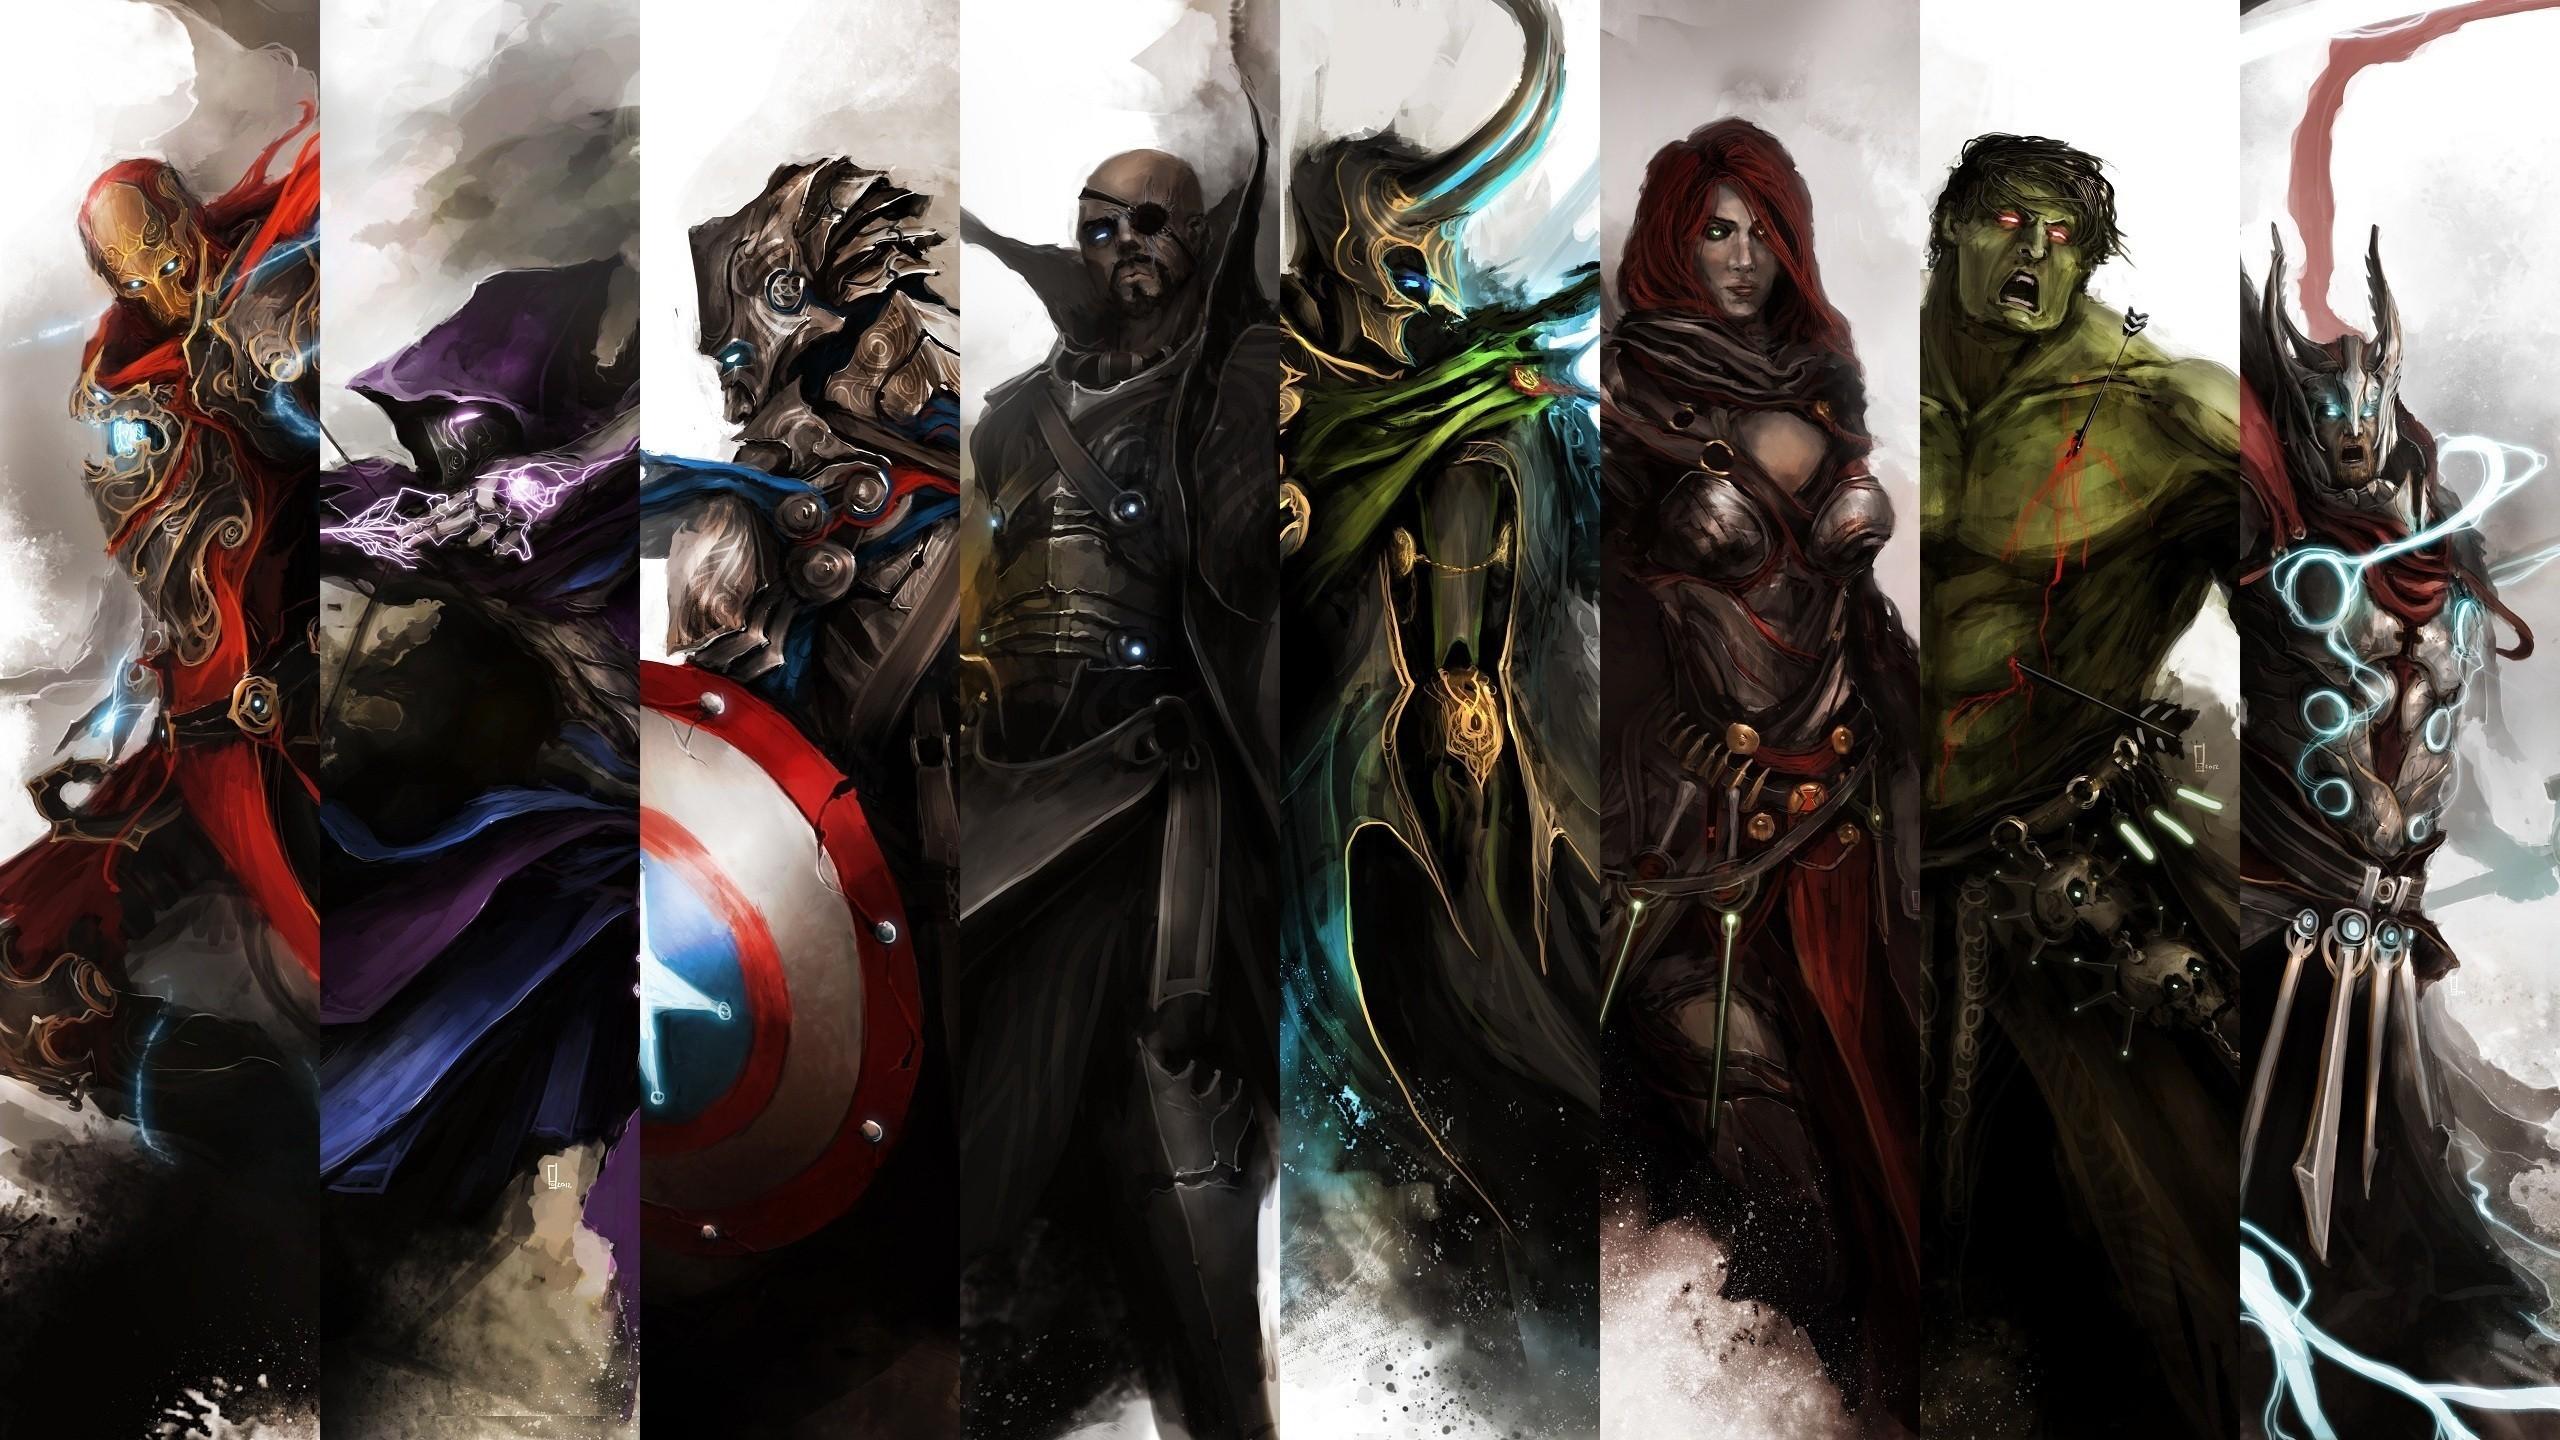 wallpaper : thor, iron man, hulk, captain america, the avengers